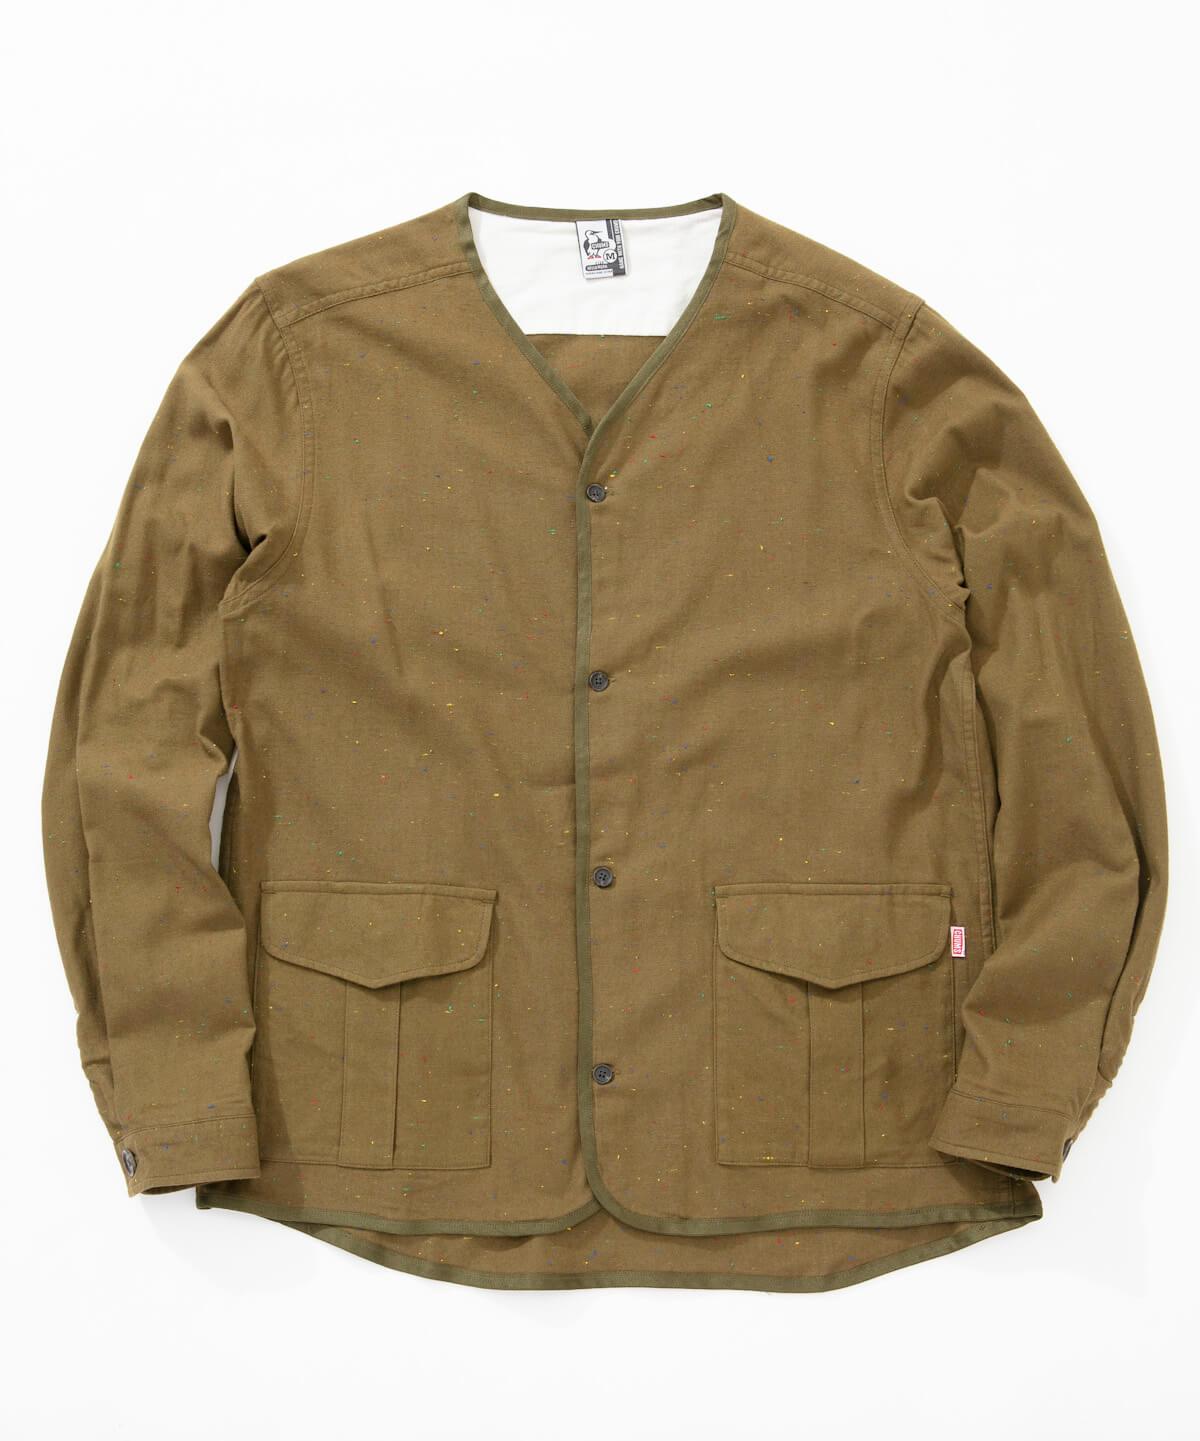 d14212a3ceb7fe No coller Nep Shirt(ノーカラーネップシャツ(トップス/シャツ))